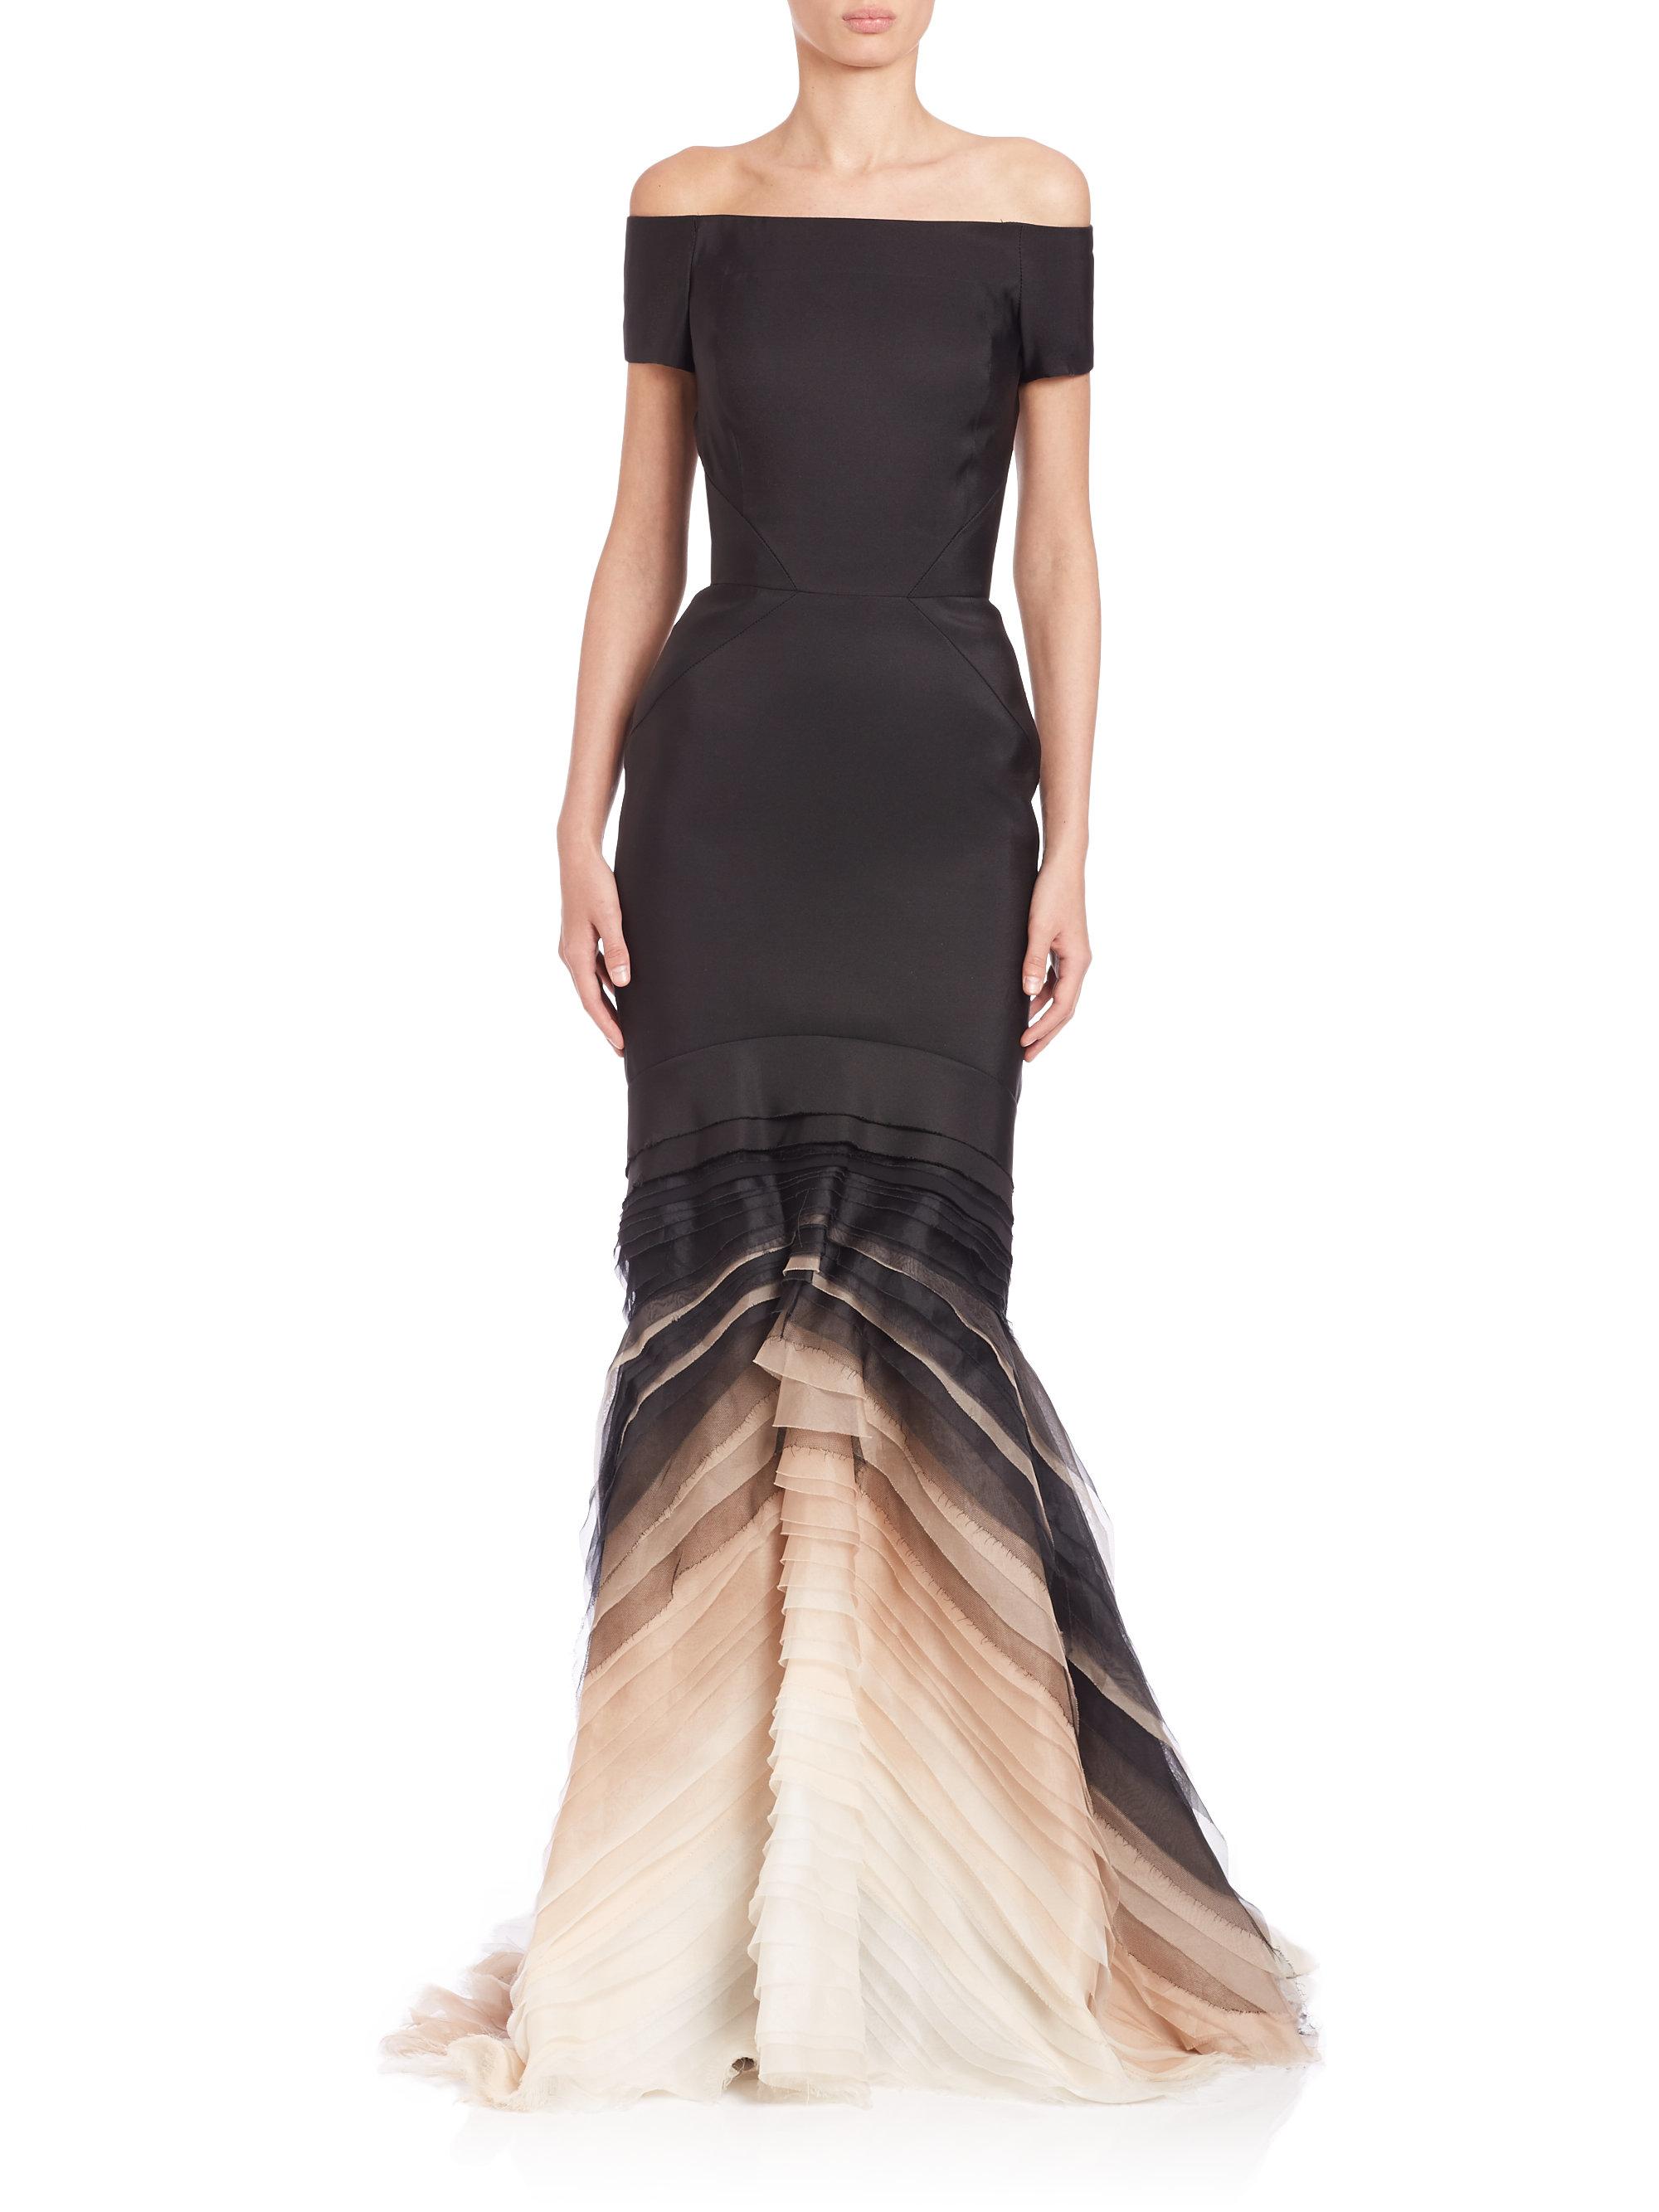 Lyst - J. Mendel Layered Silk Degrade Gown in Black